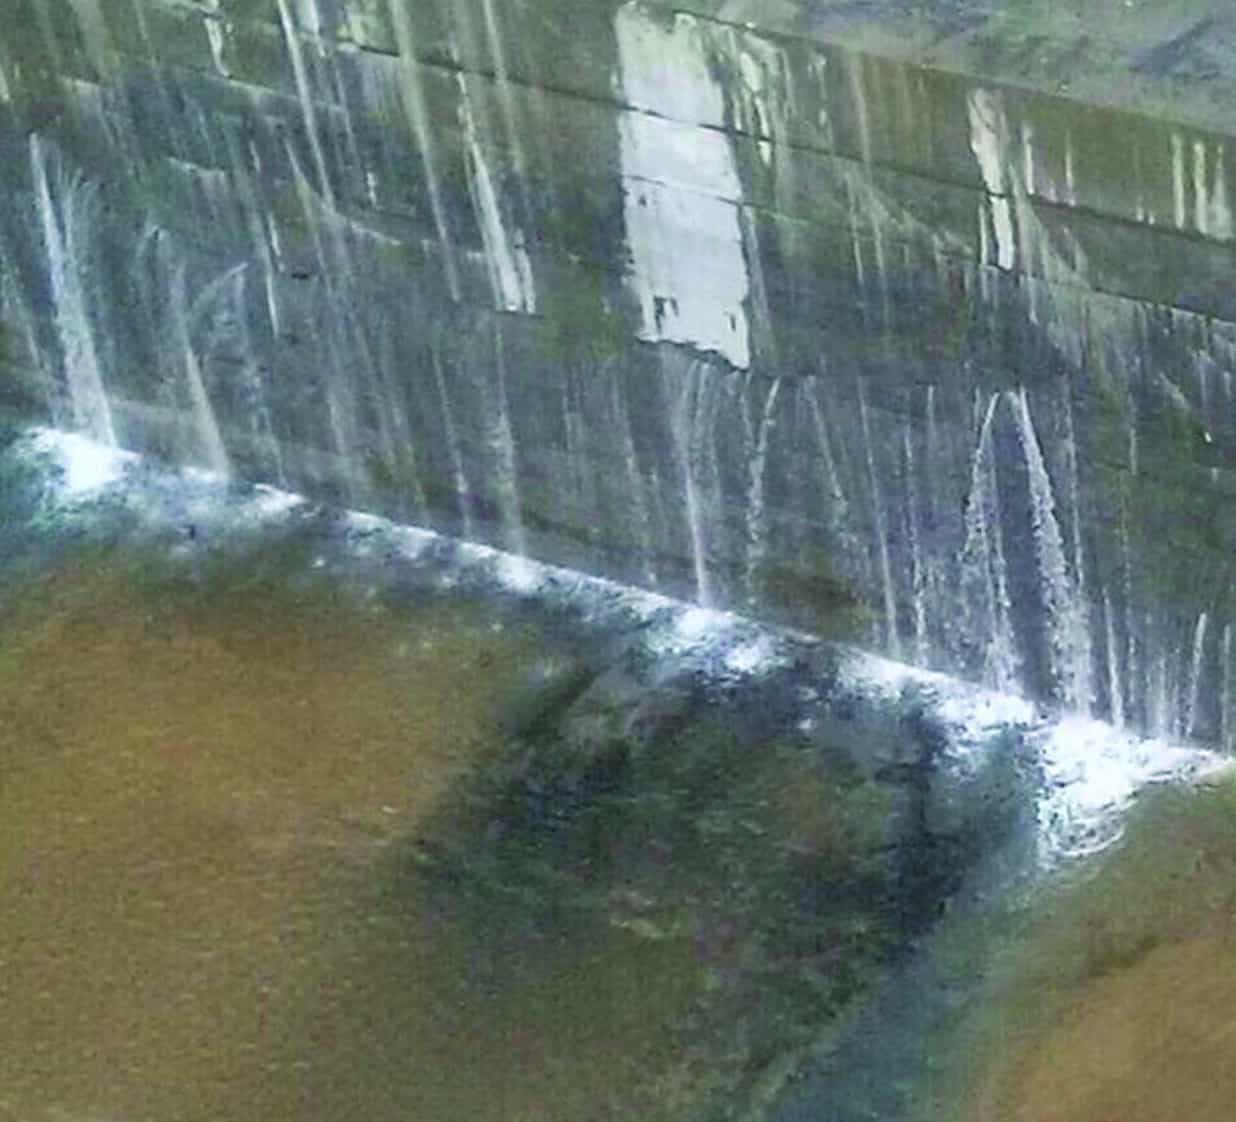 Cracks in lock may delay Panama Canal expansion